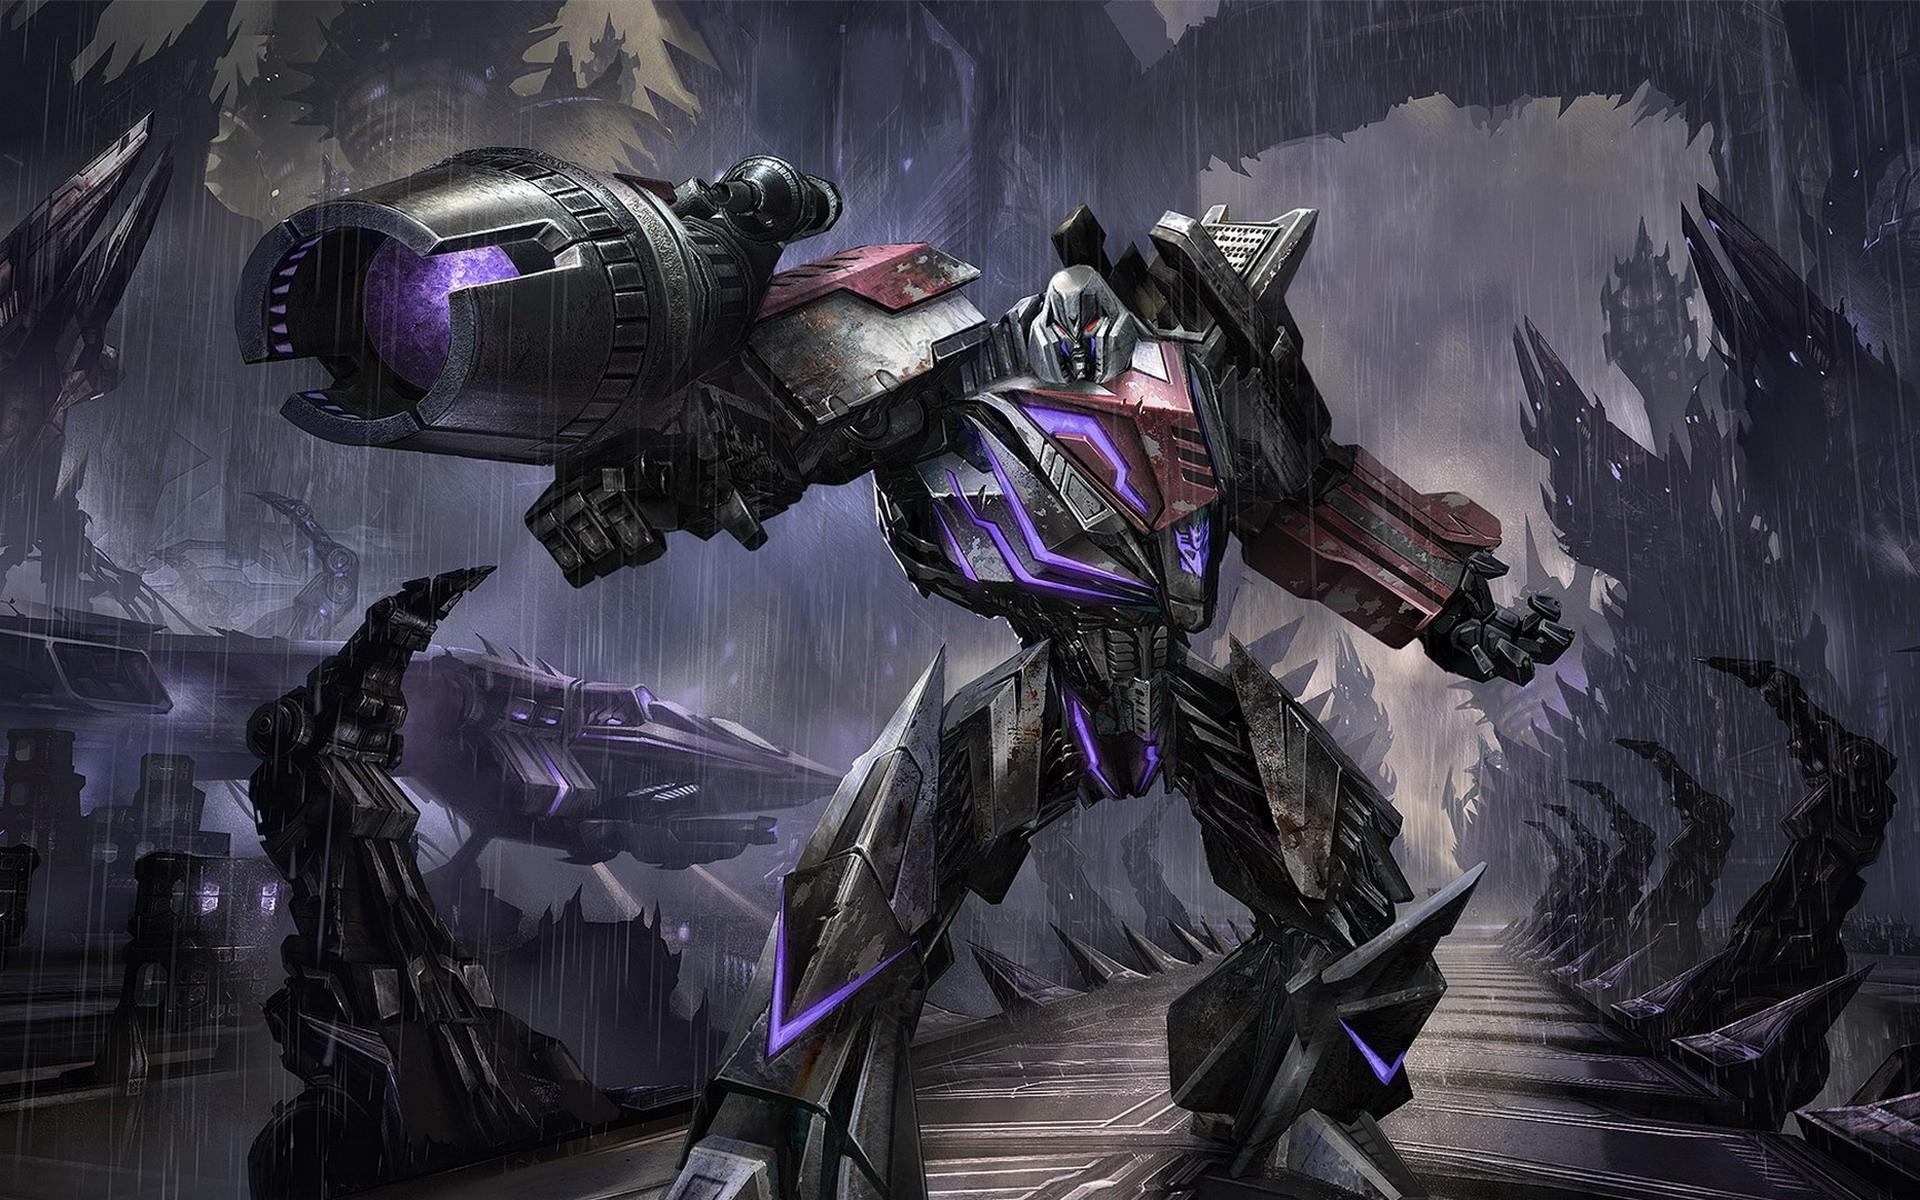 Fall Of Cybertron Wallpaper Hd Transformers War For Cybertron Game Wallpapers Hd